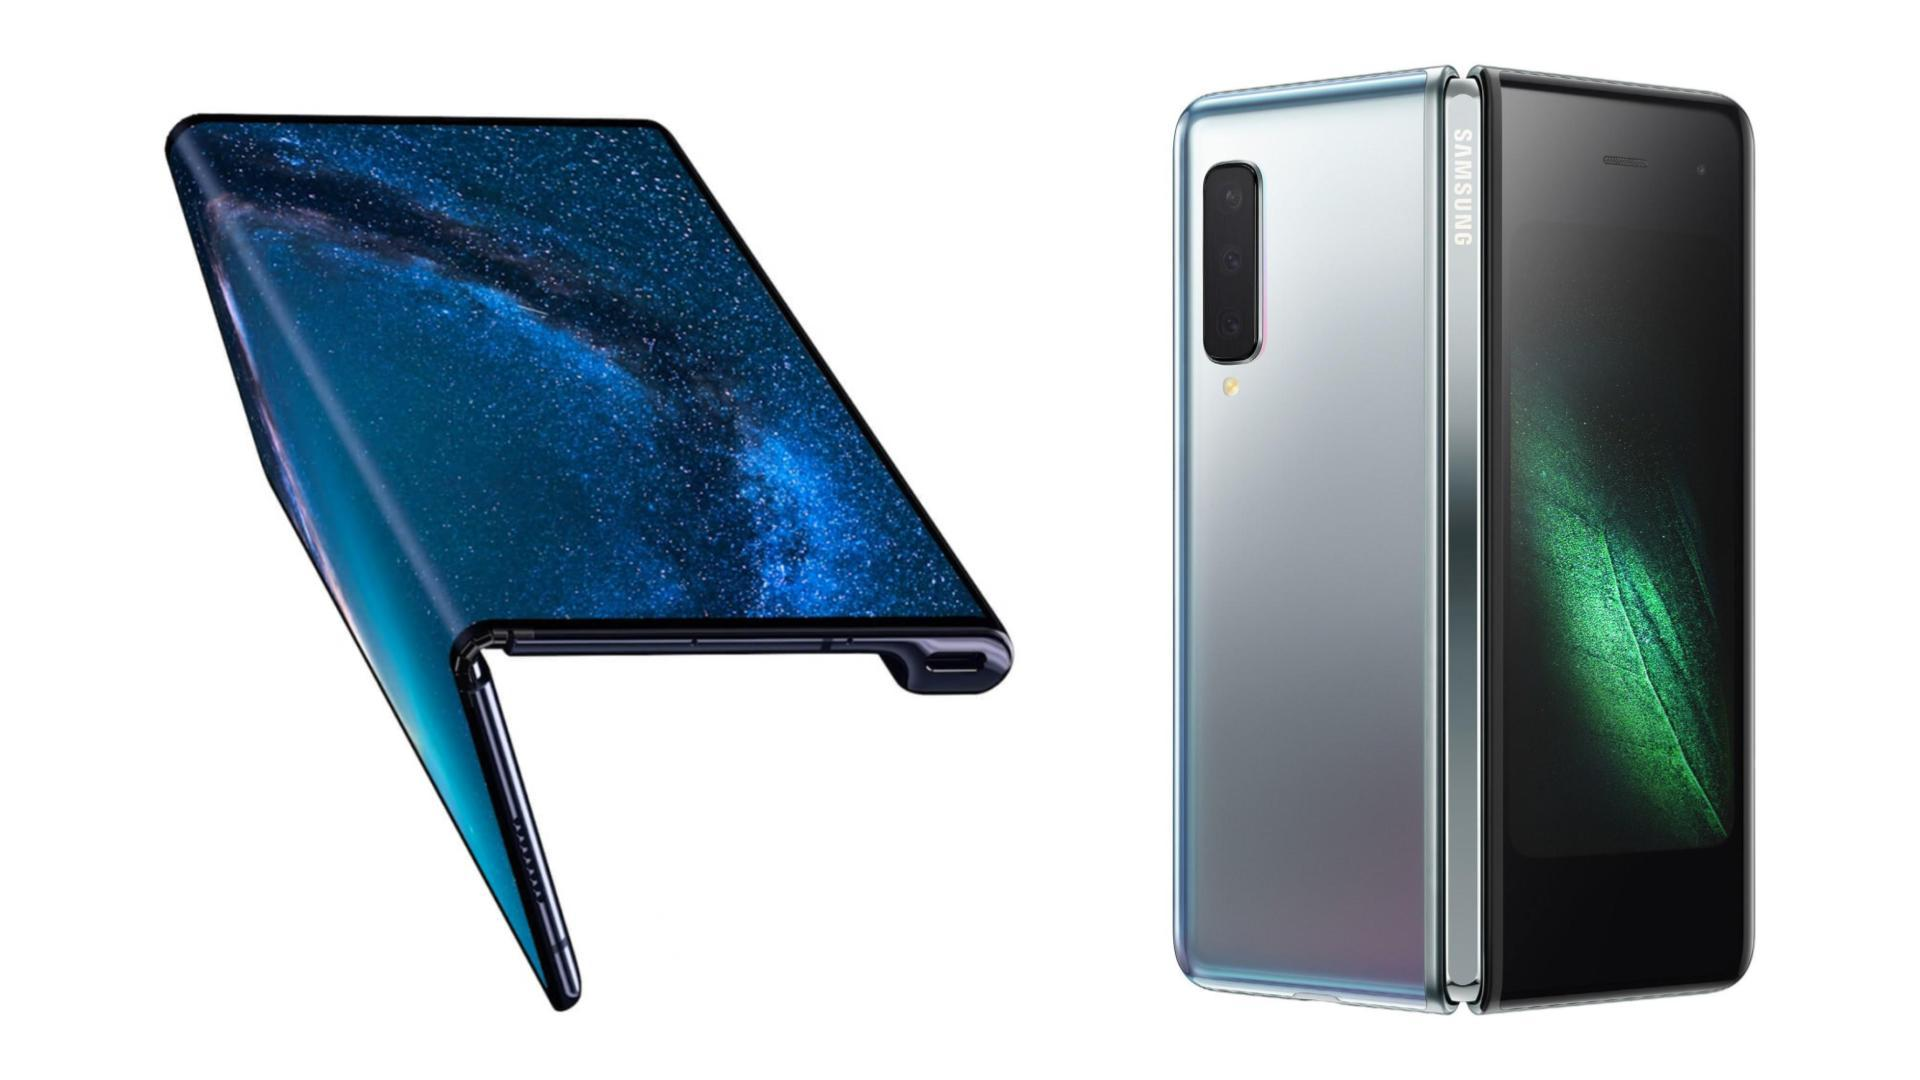 Le Huawei Mate X nous a fait oublier le Samsung Galaxy Fold